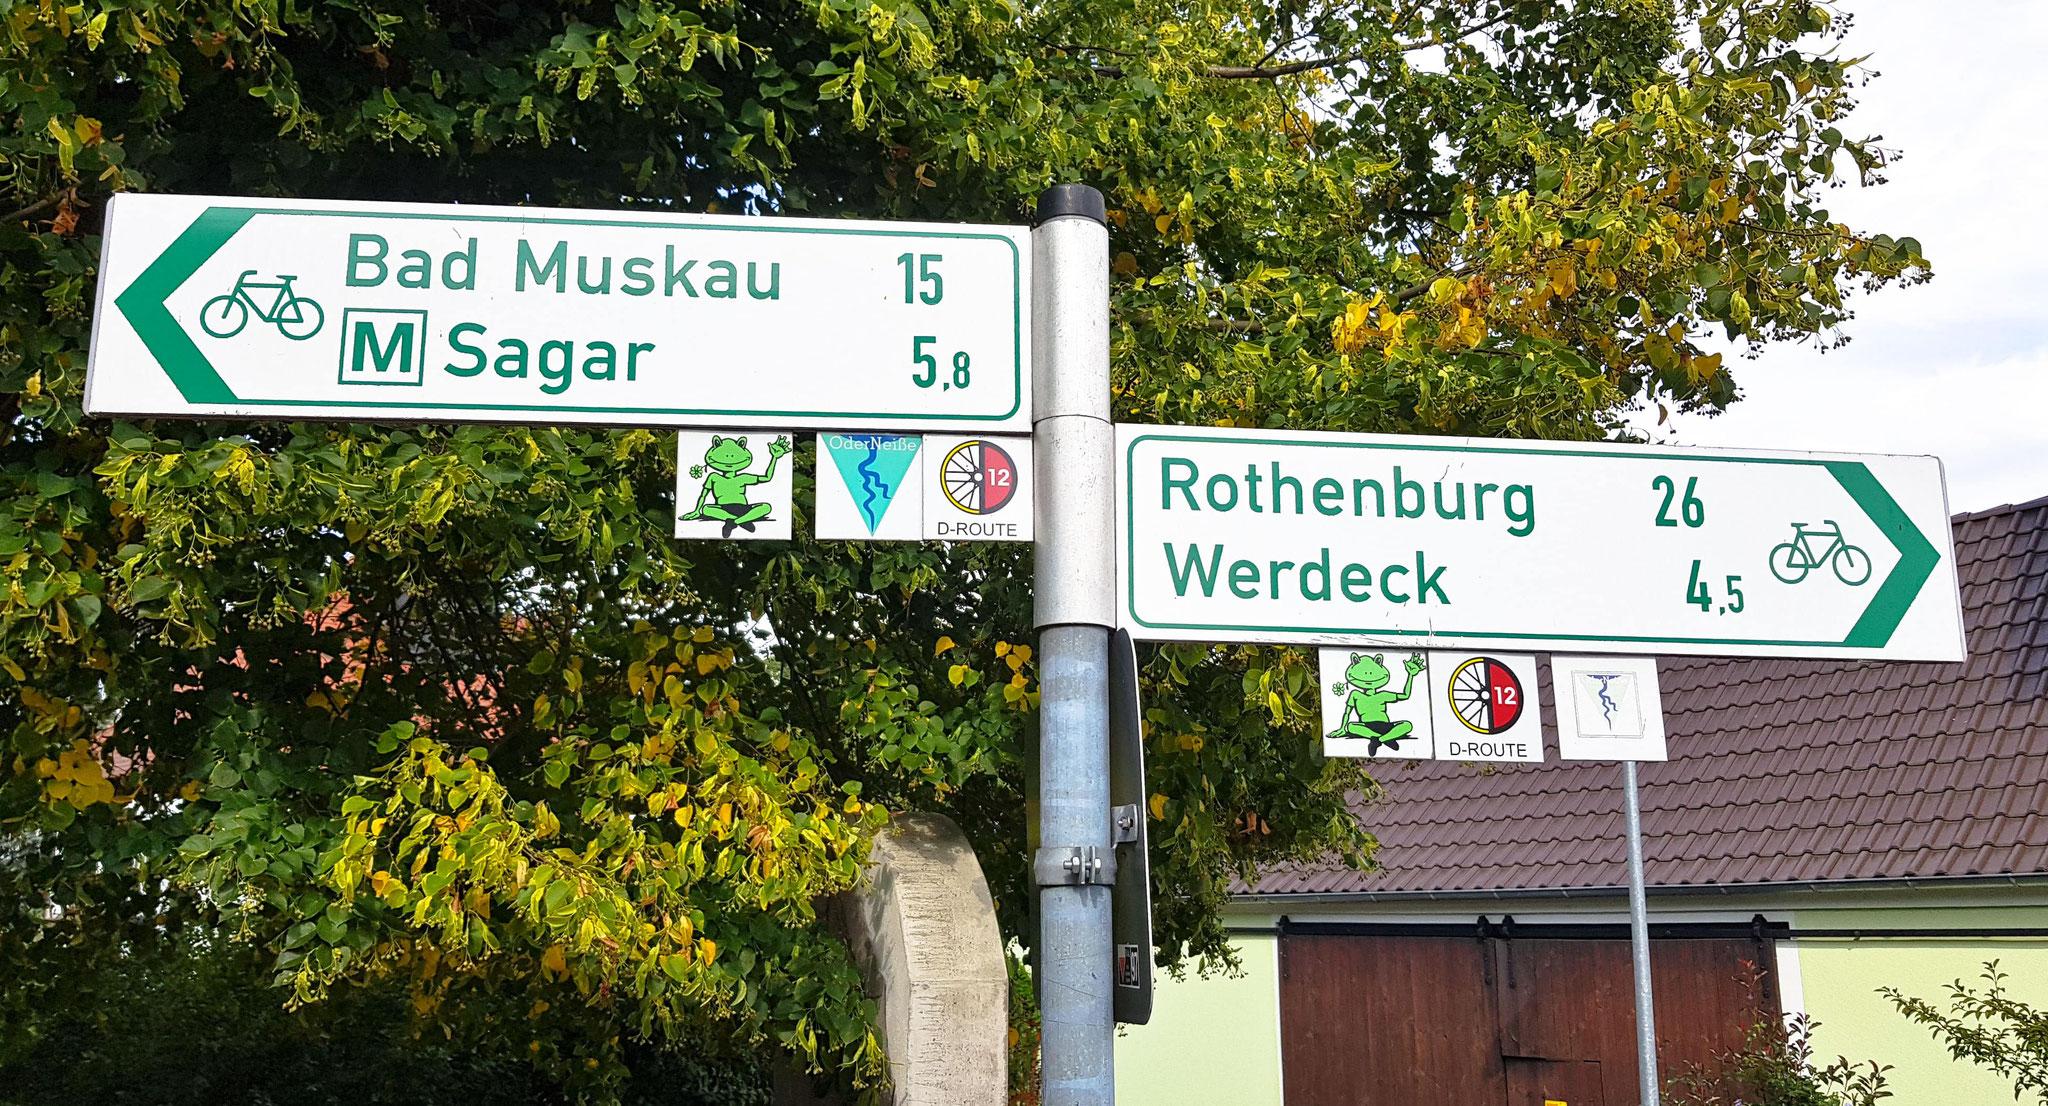 15 km hinter Bad Muskau! Bald am Ziel